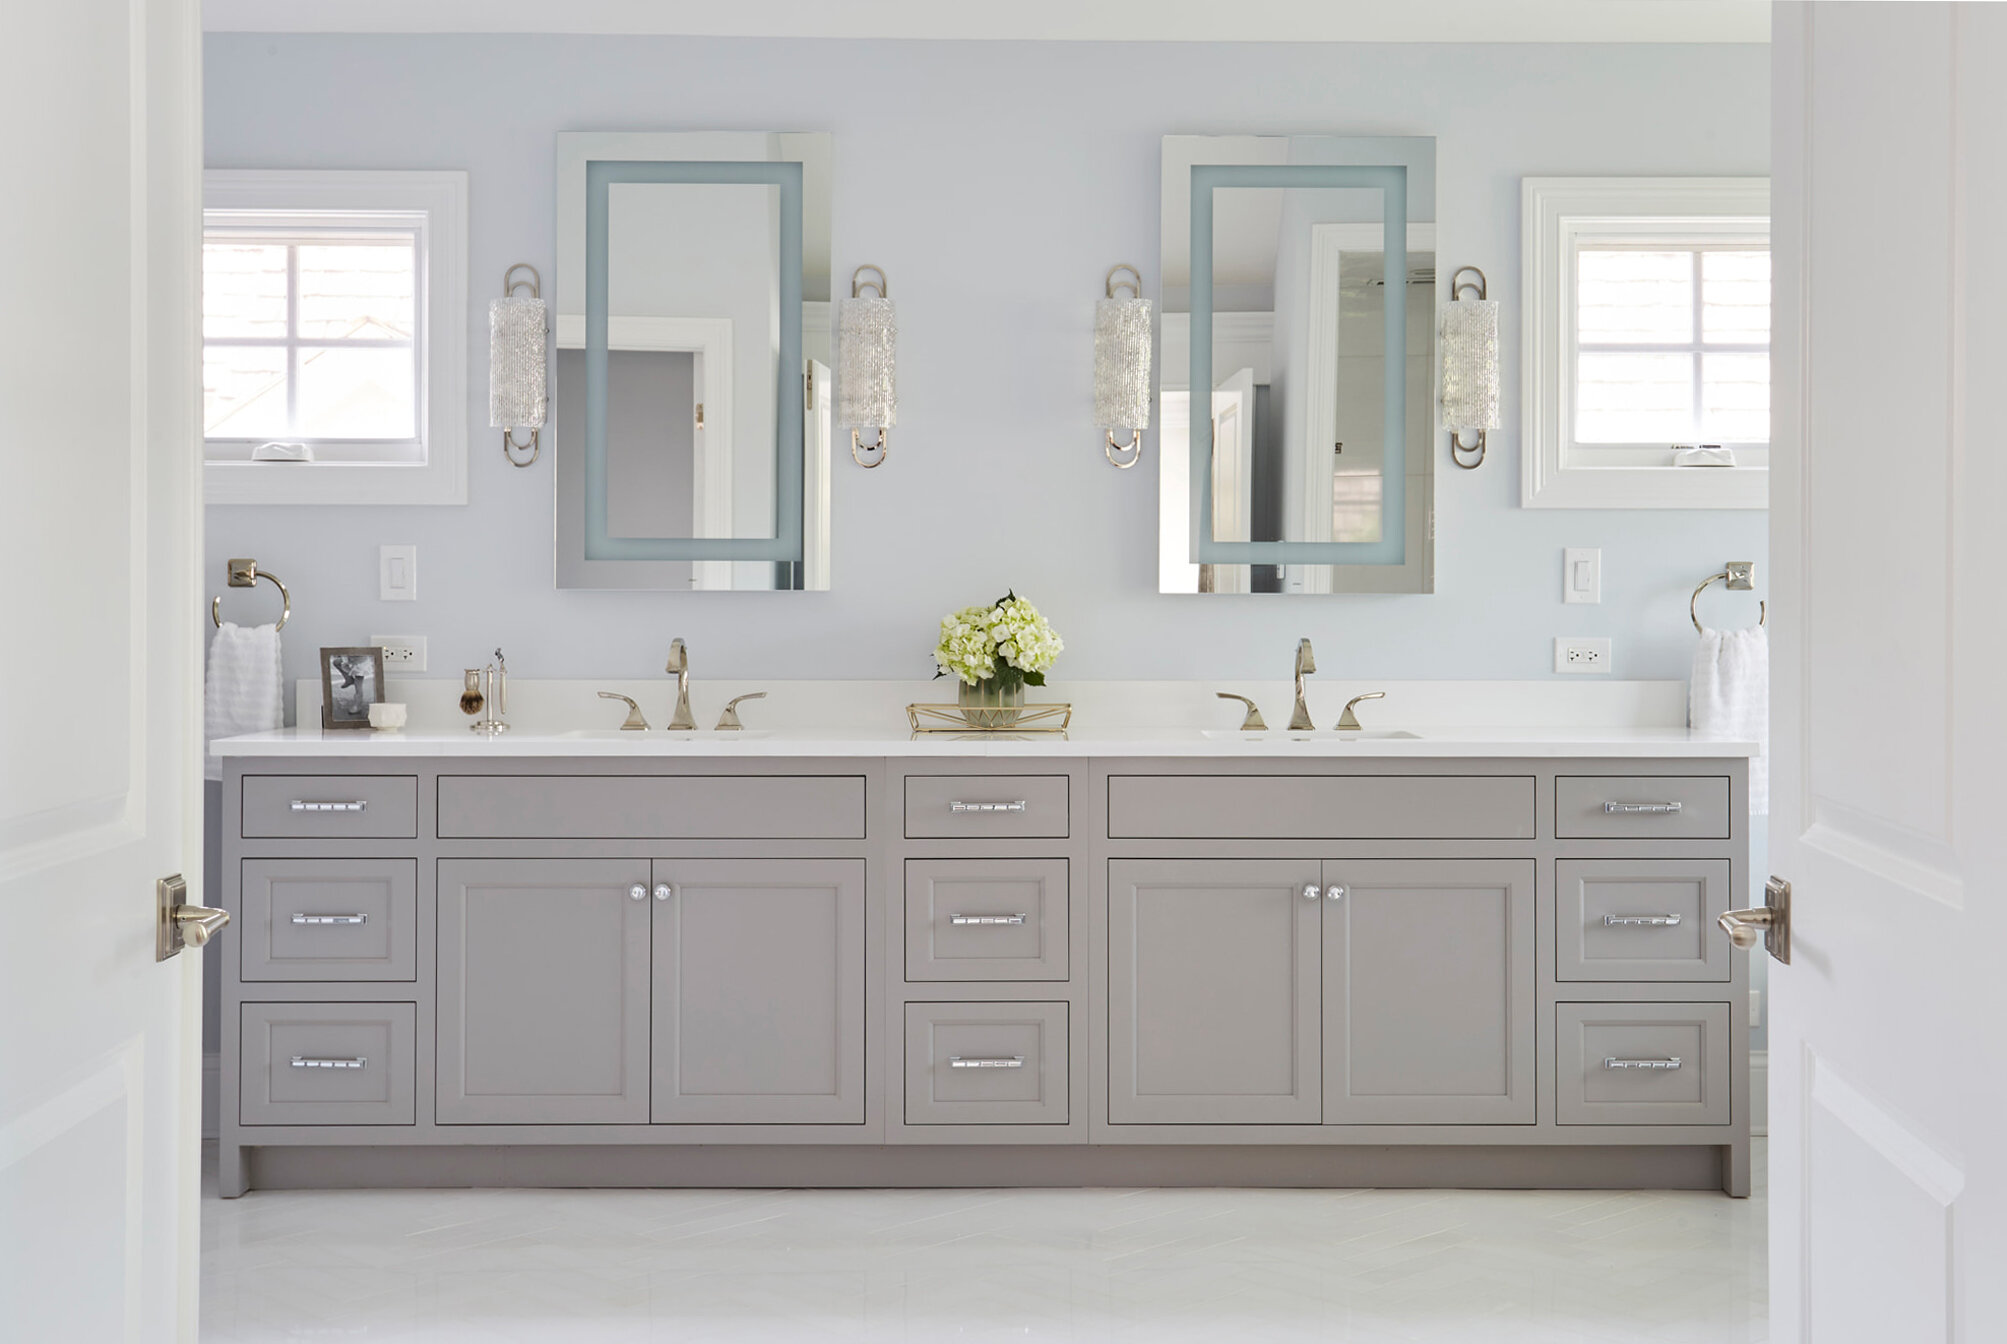 Amazing Master Bath Remodel The